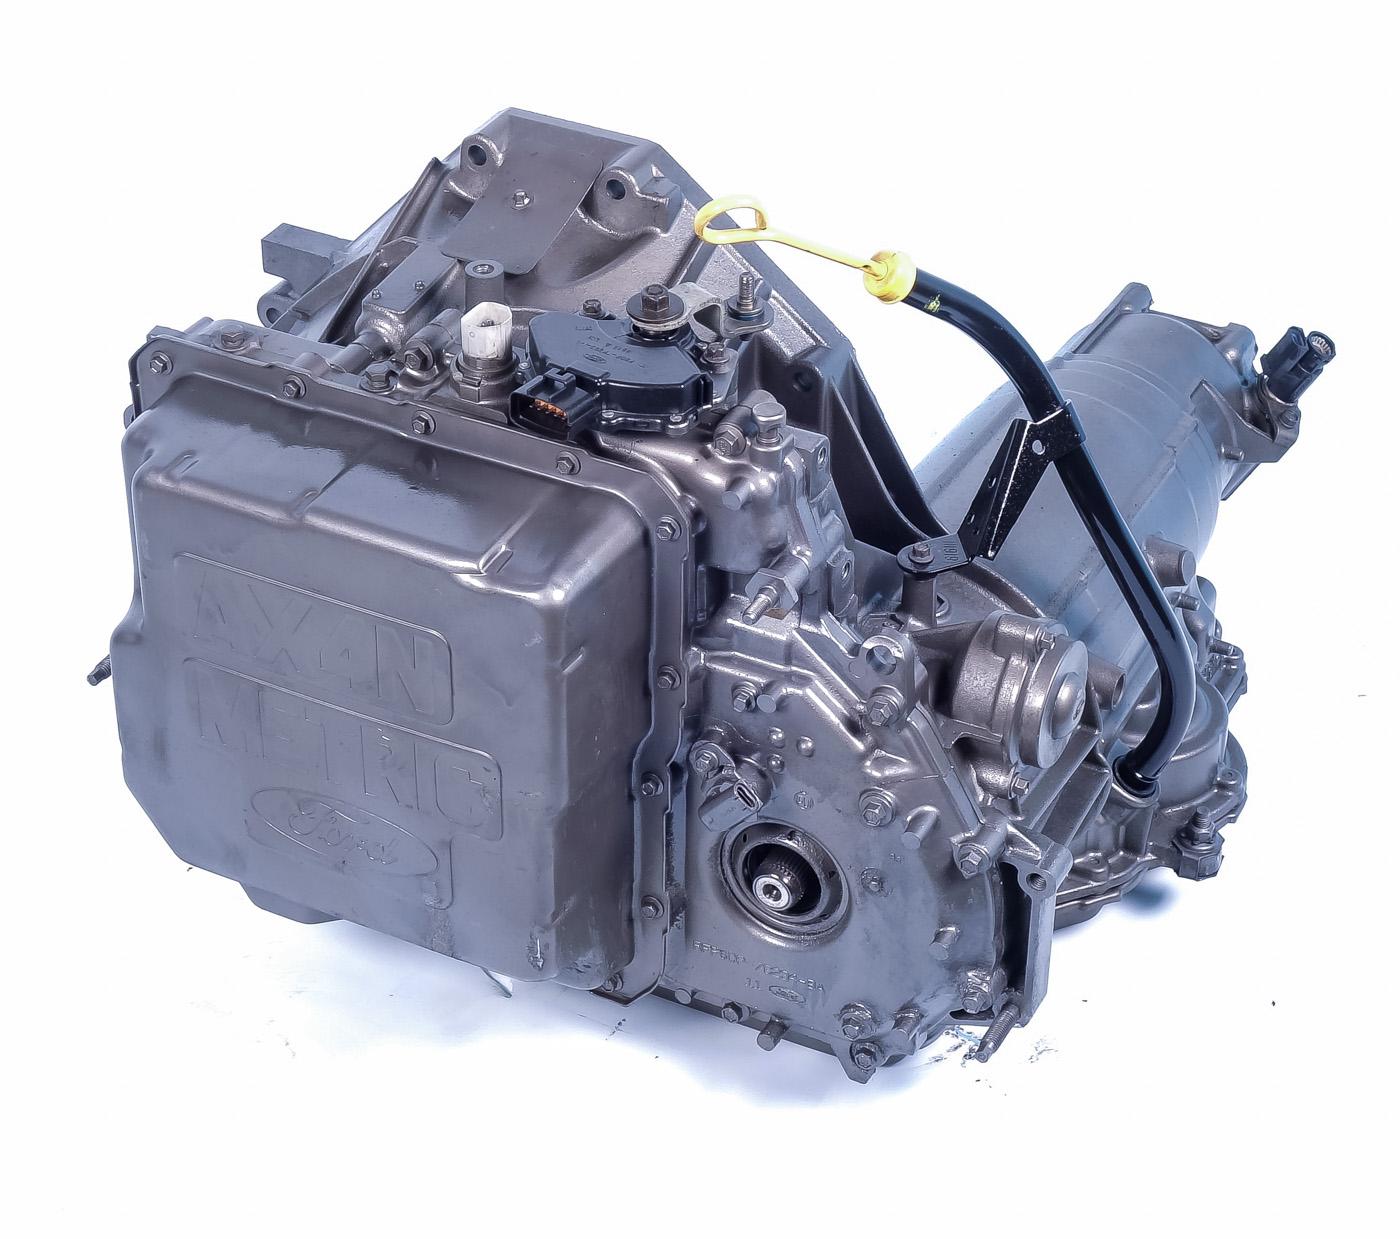 2000 Malibu Engine Diagram